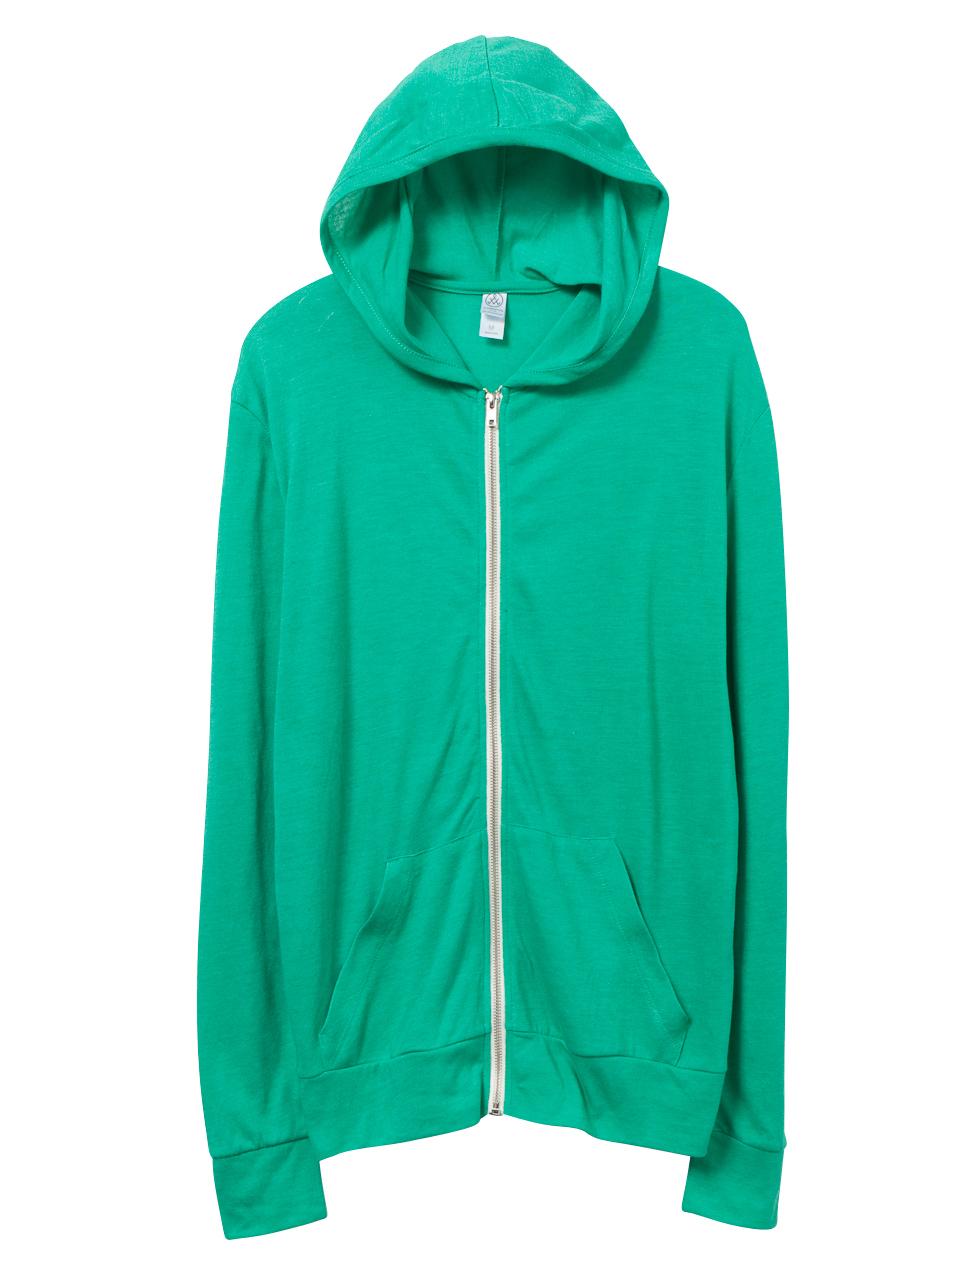 Alternative Apparel Basic Eco Jersey Zip Hoodie In Green